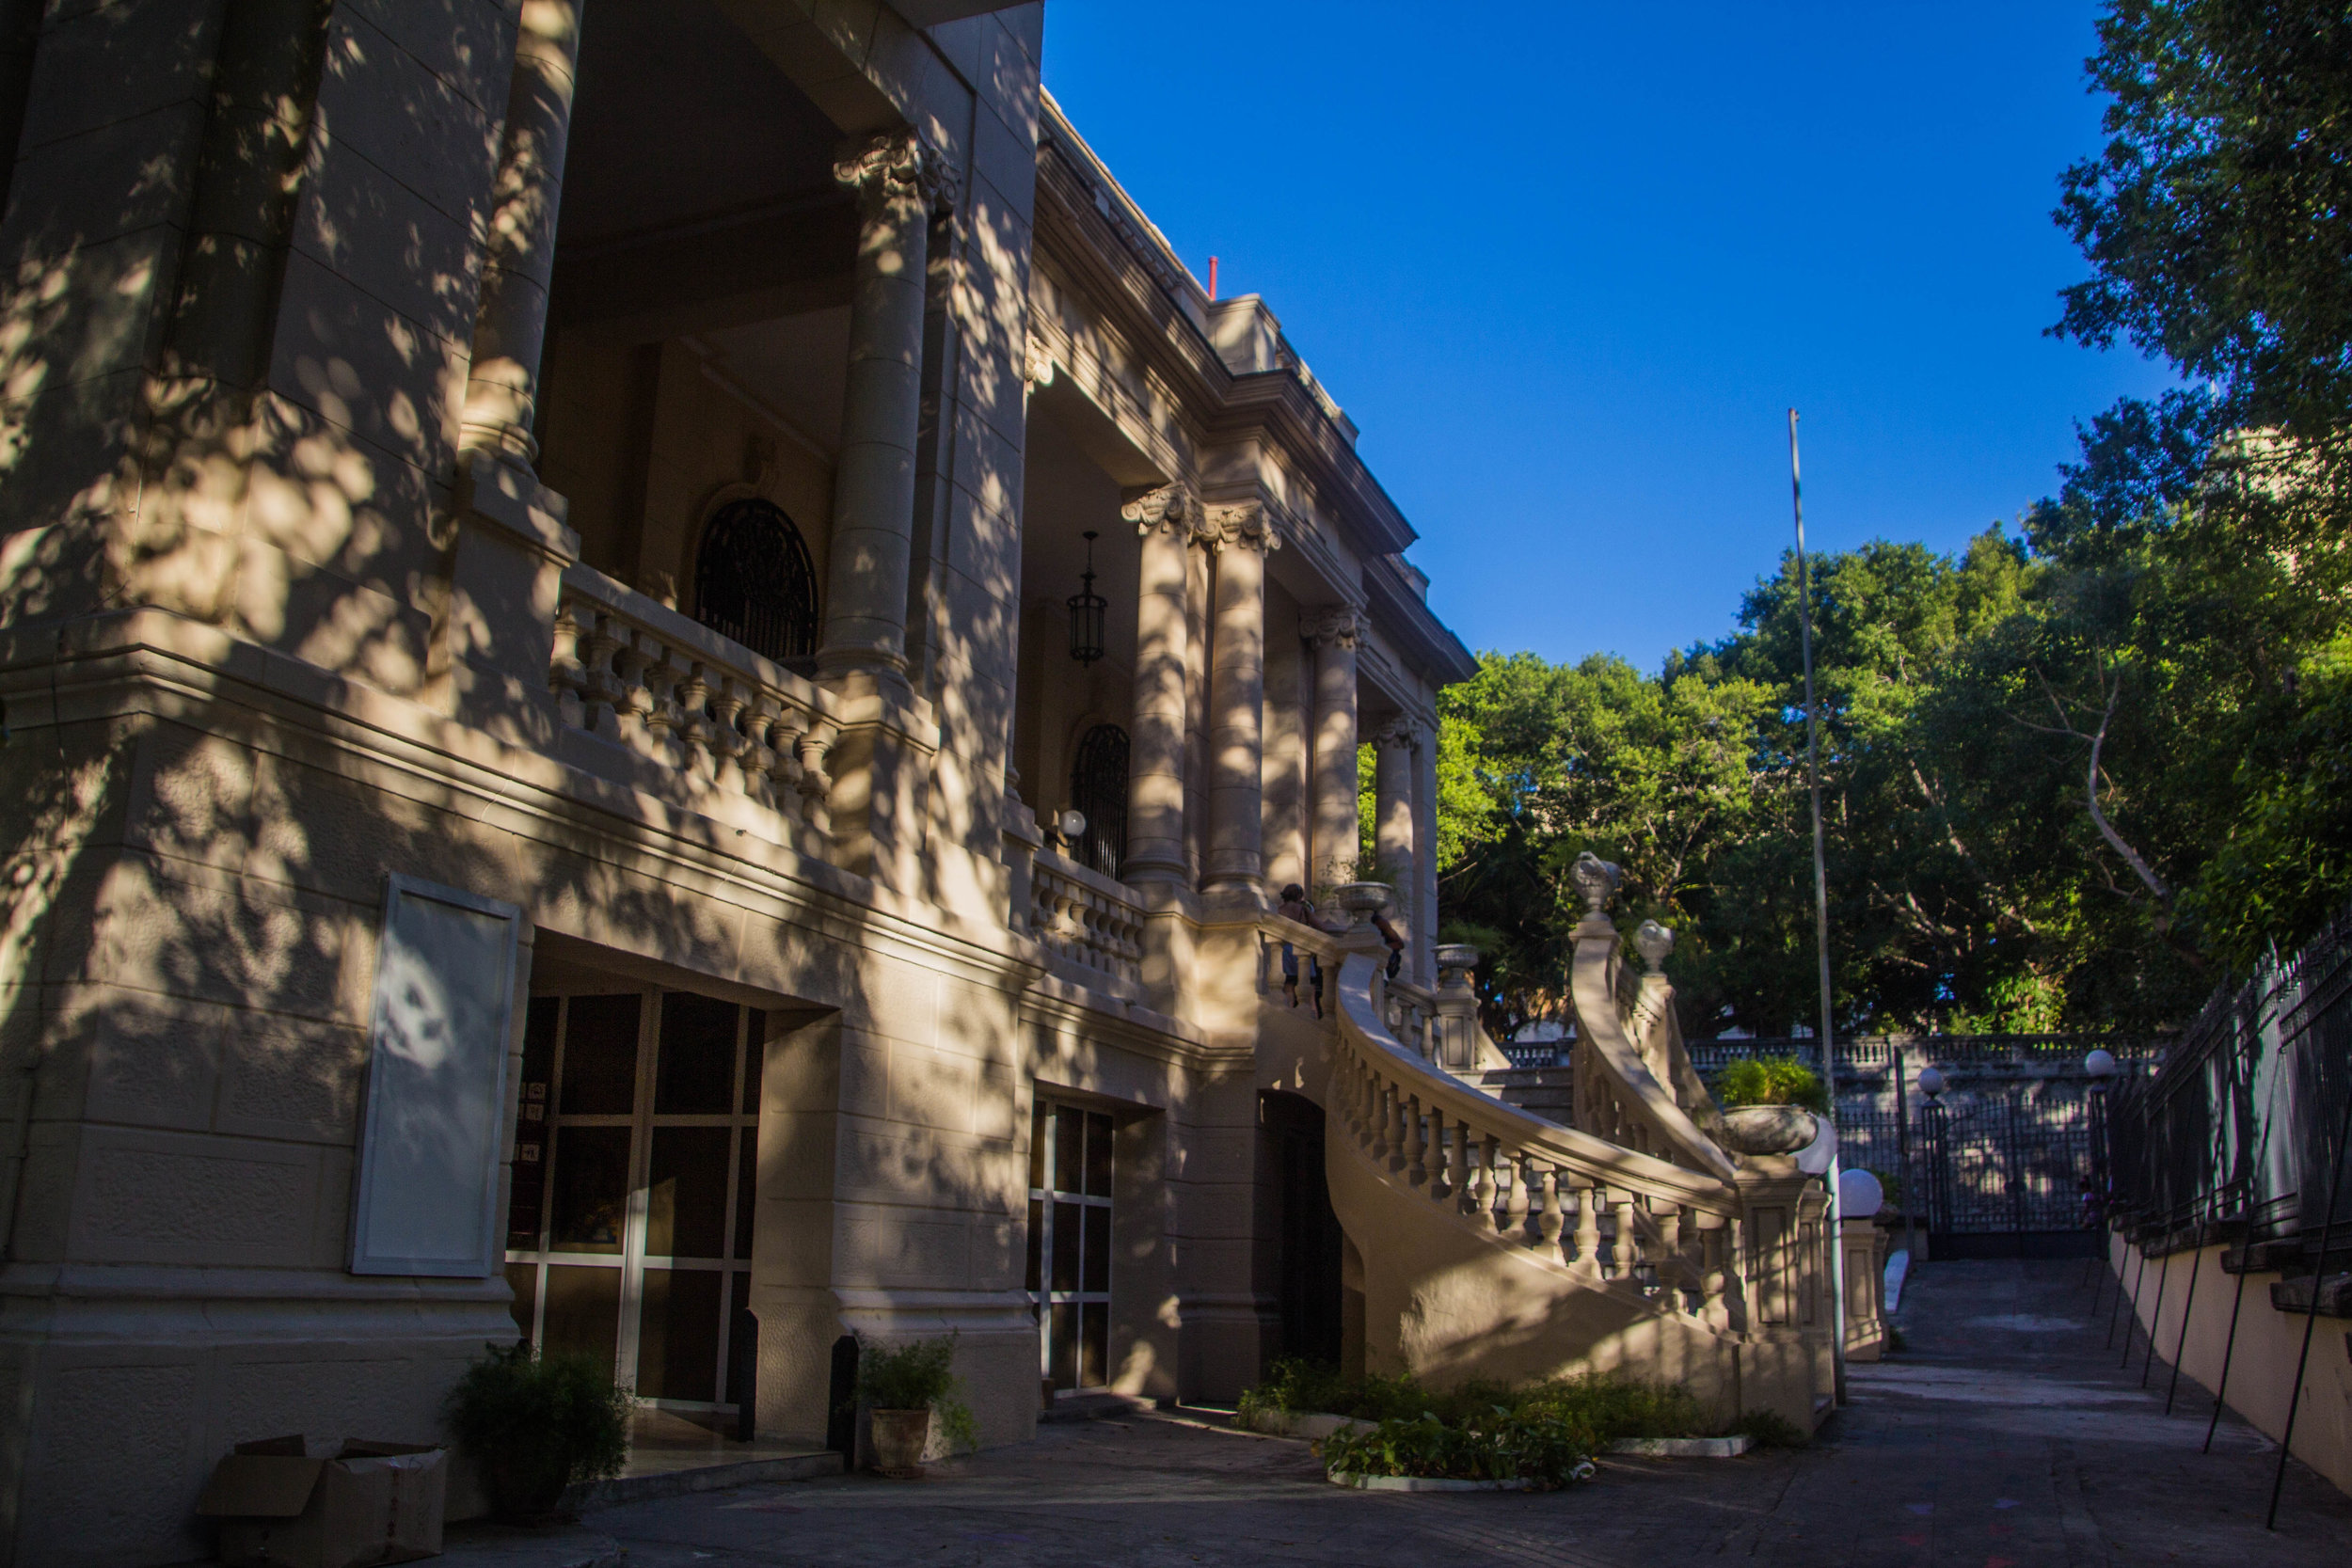 university of havana cuba-3-2.jpg